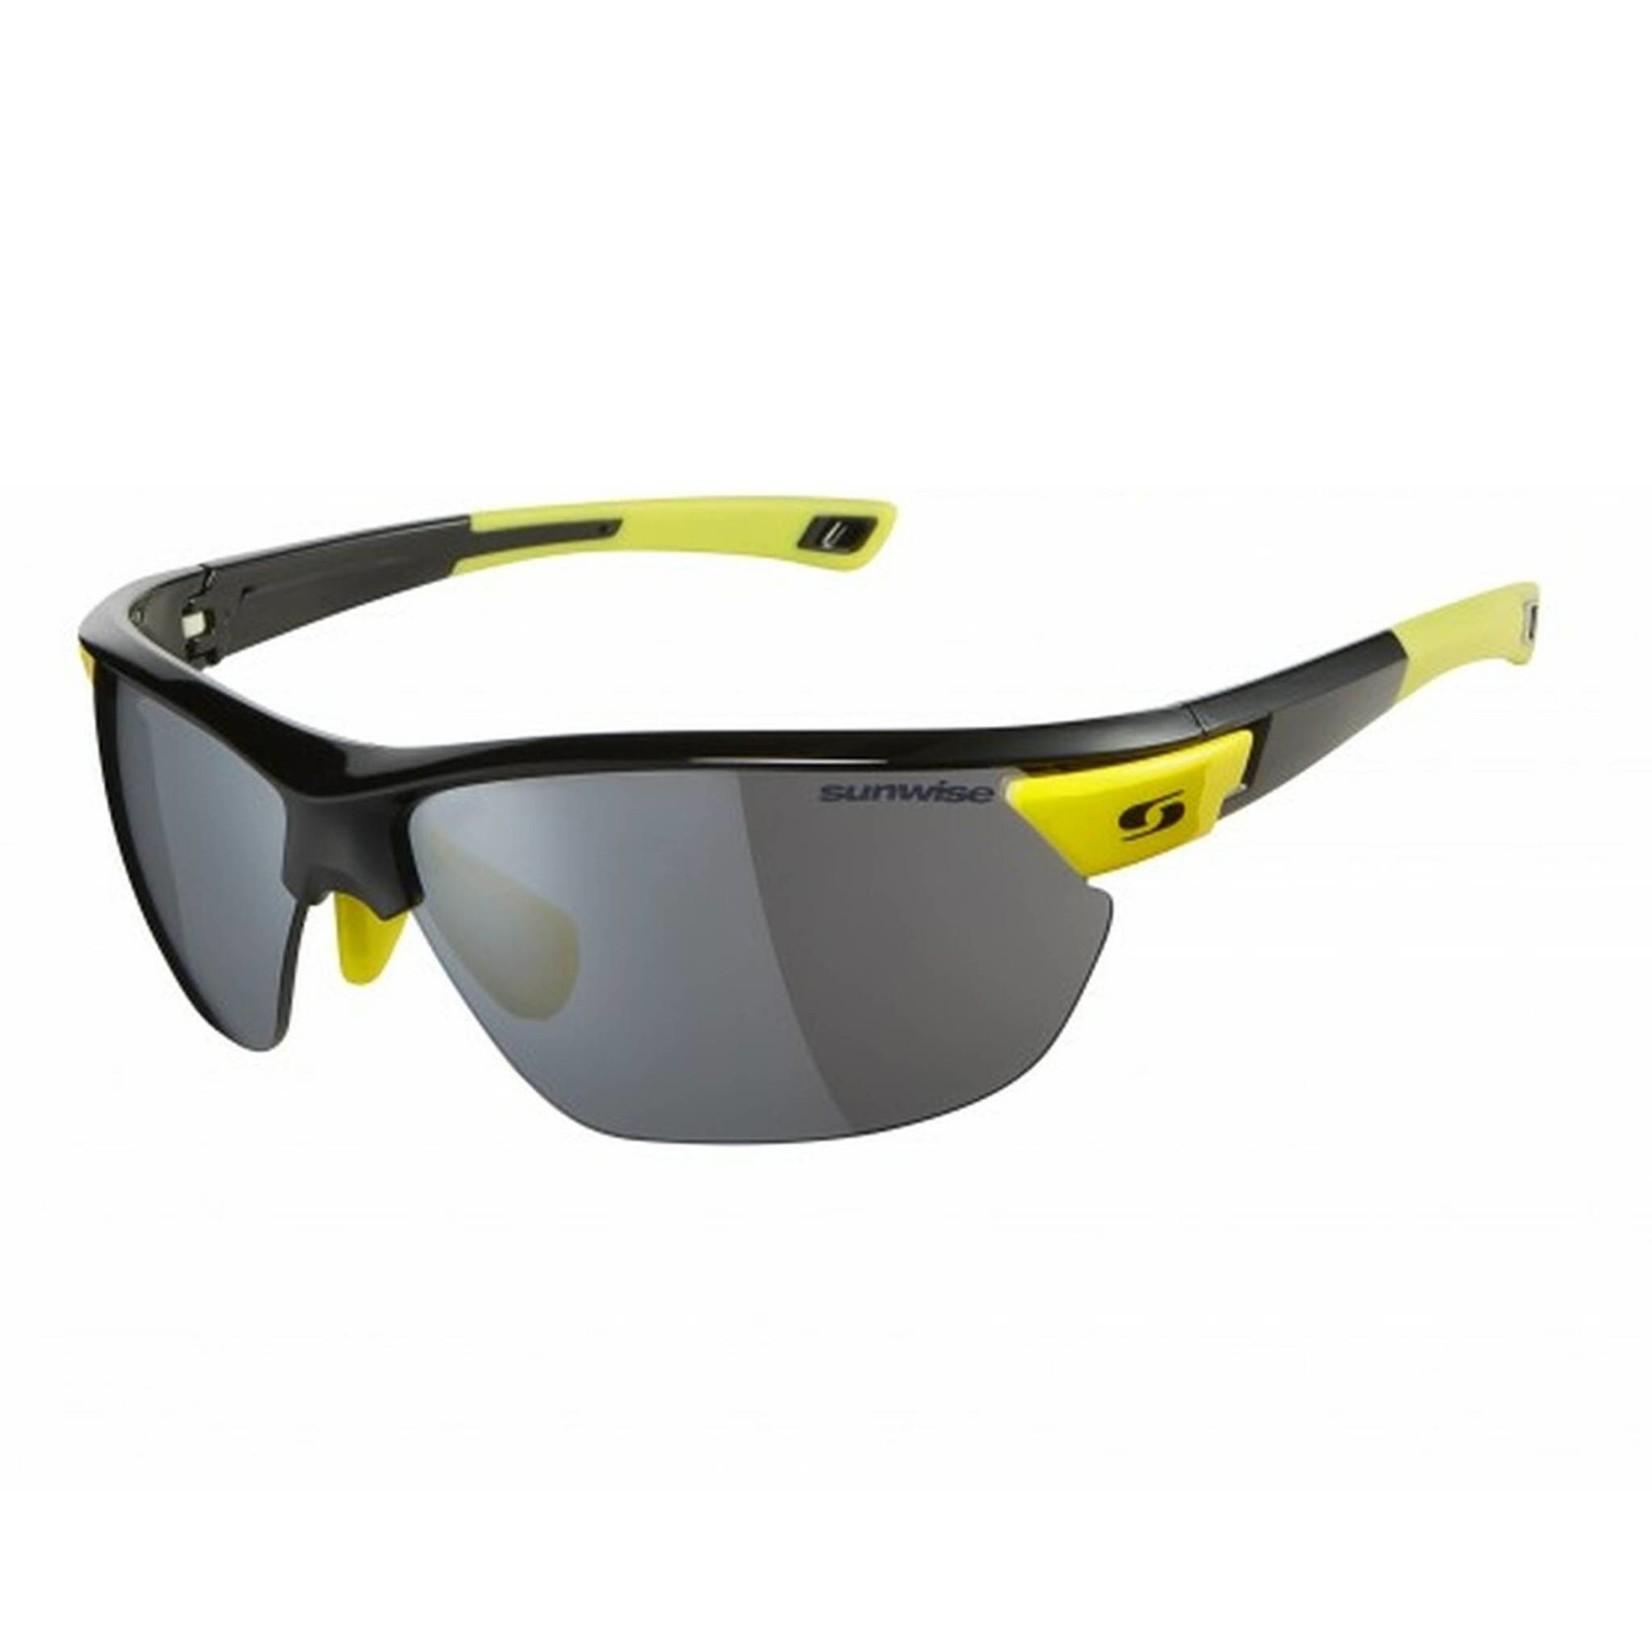 Sunwise Kennington Sunglasses Black/Yellow